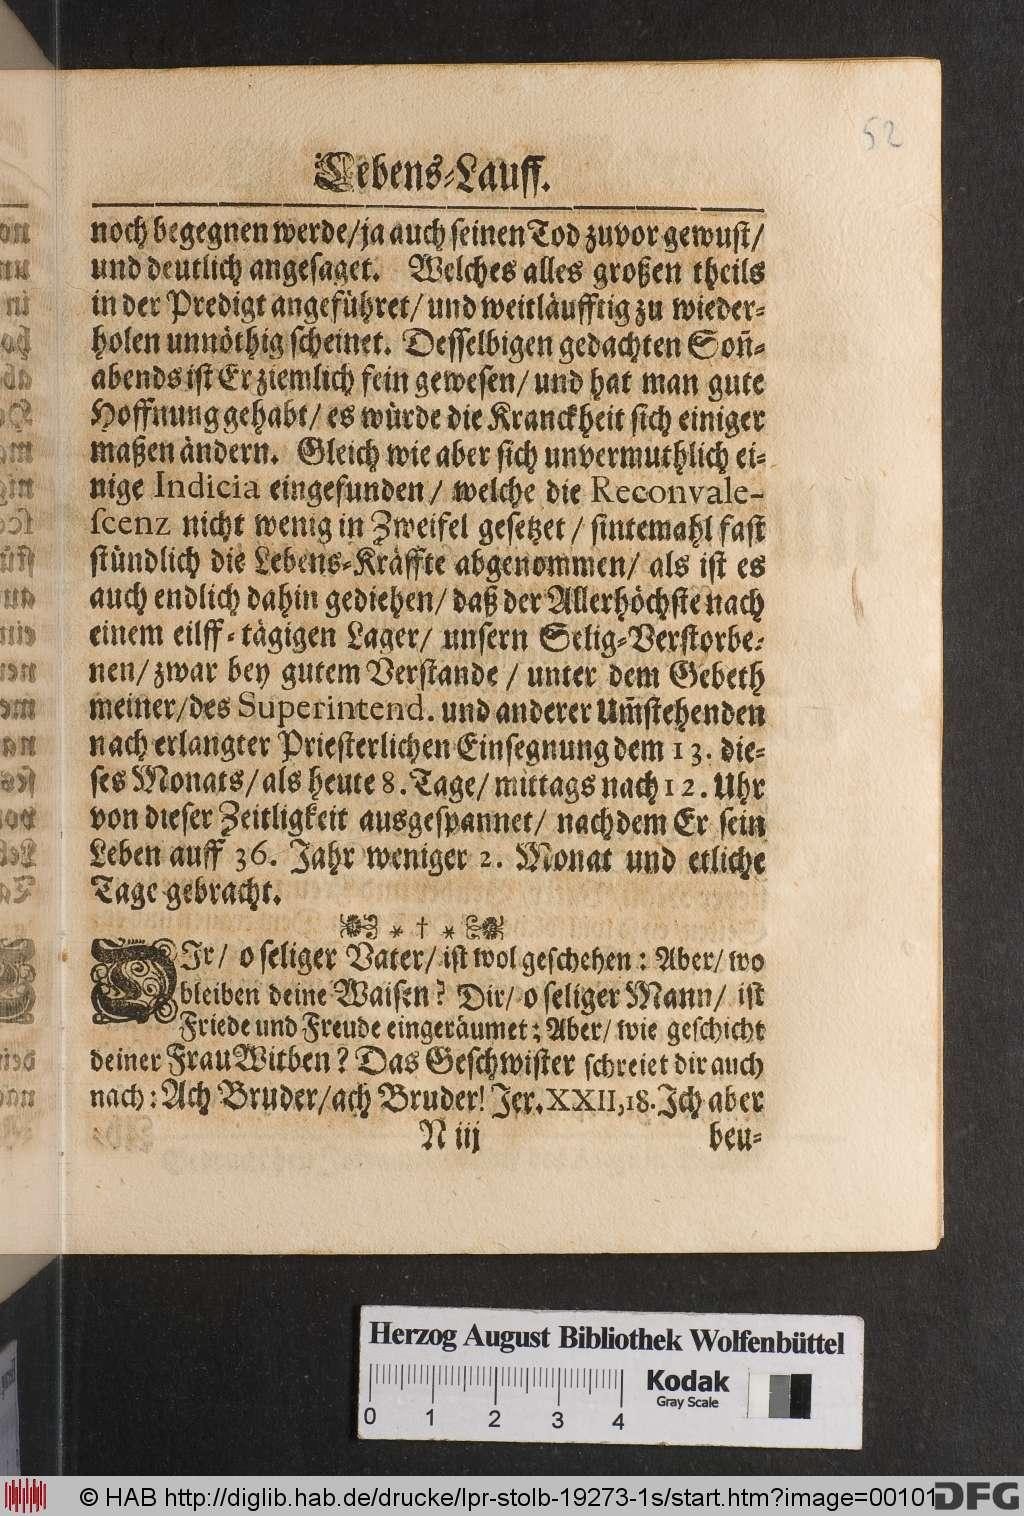 http://diglib.hab.de/drucke/lpr-stolb-19273-1s/00101.jpg